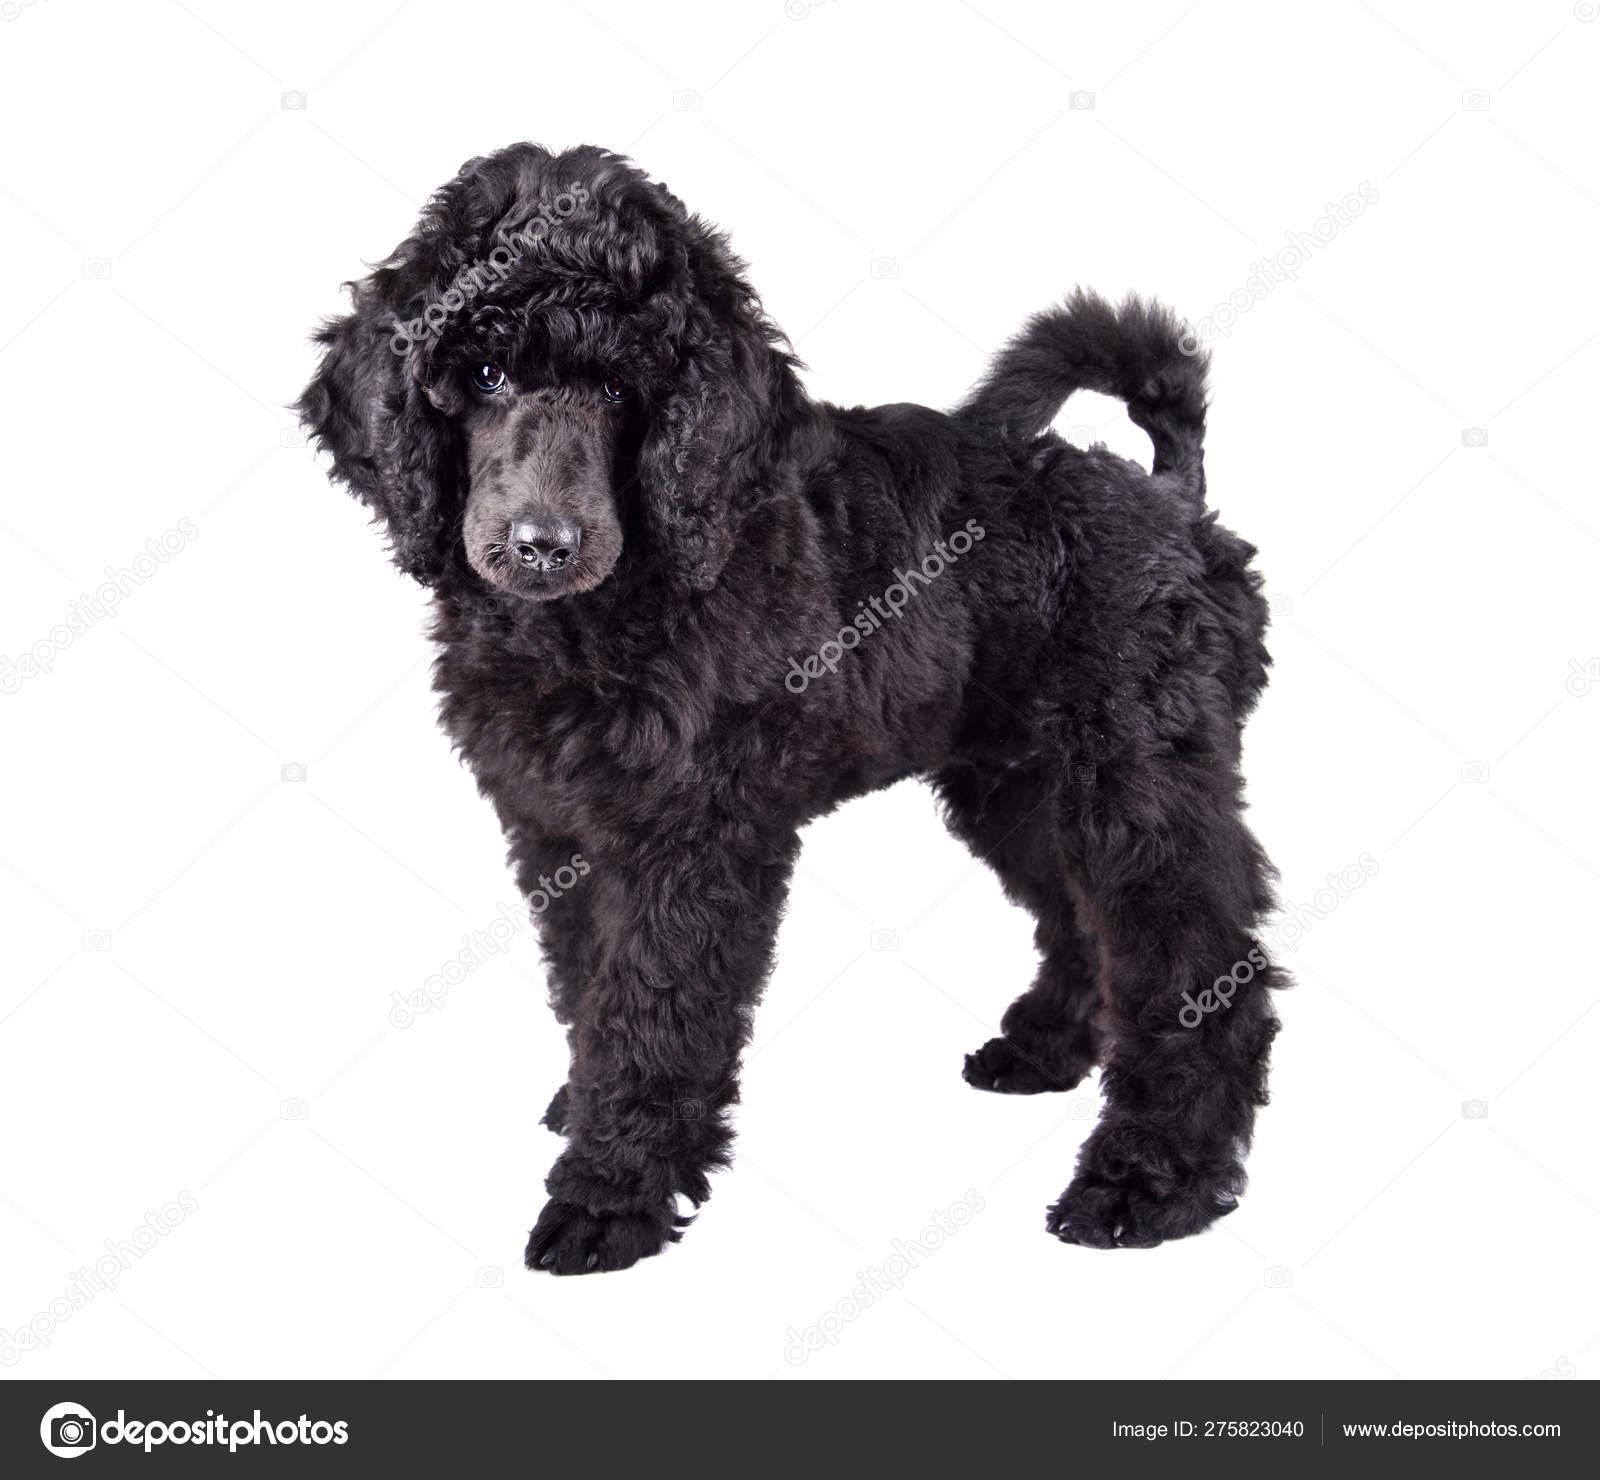 Black Poodle puppy — Stock Photo © eAlisa #275823040